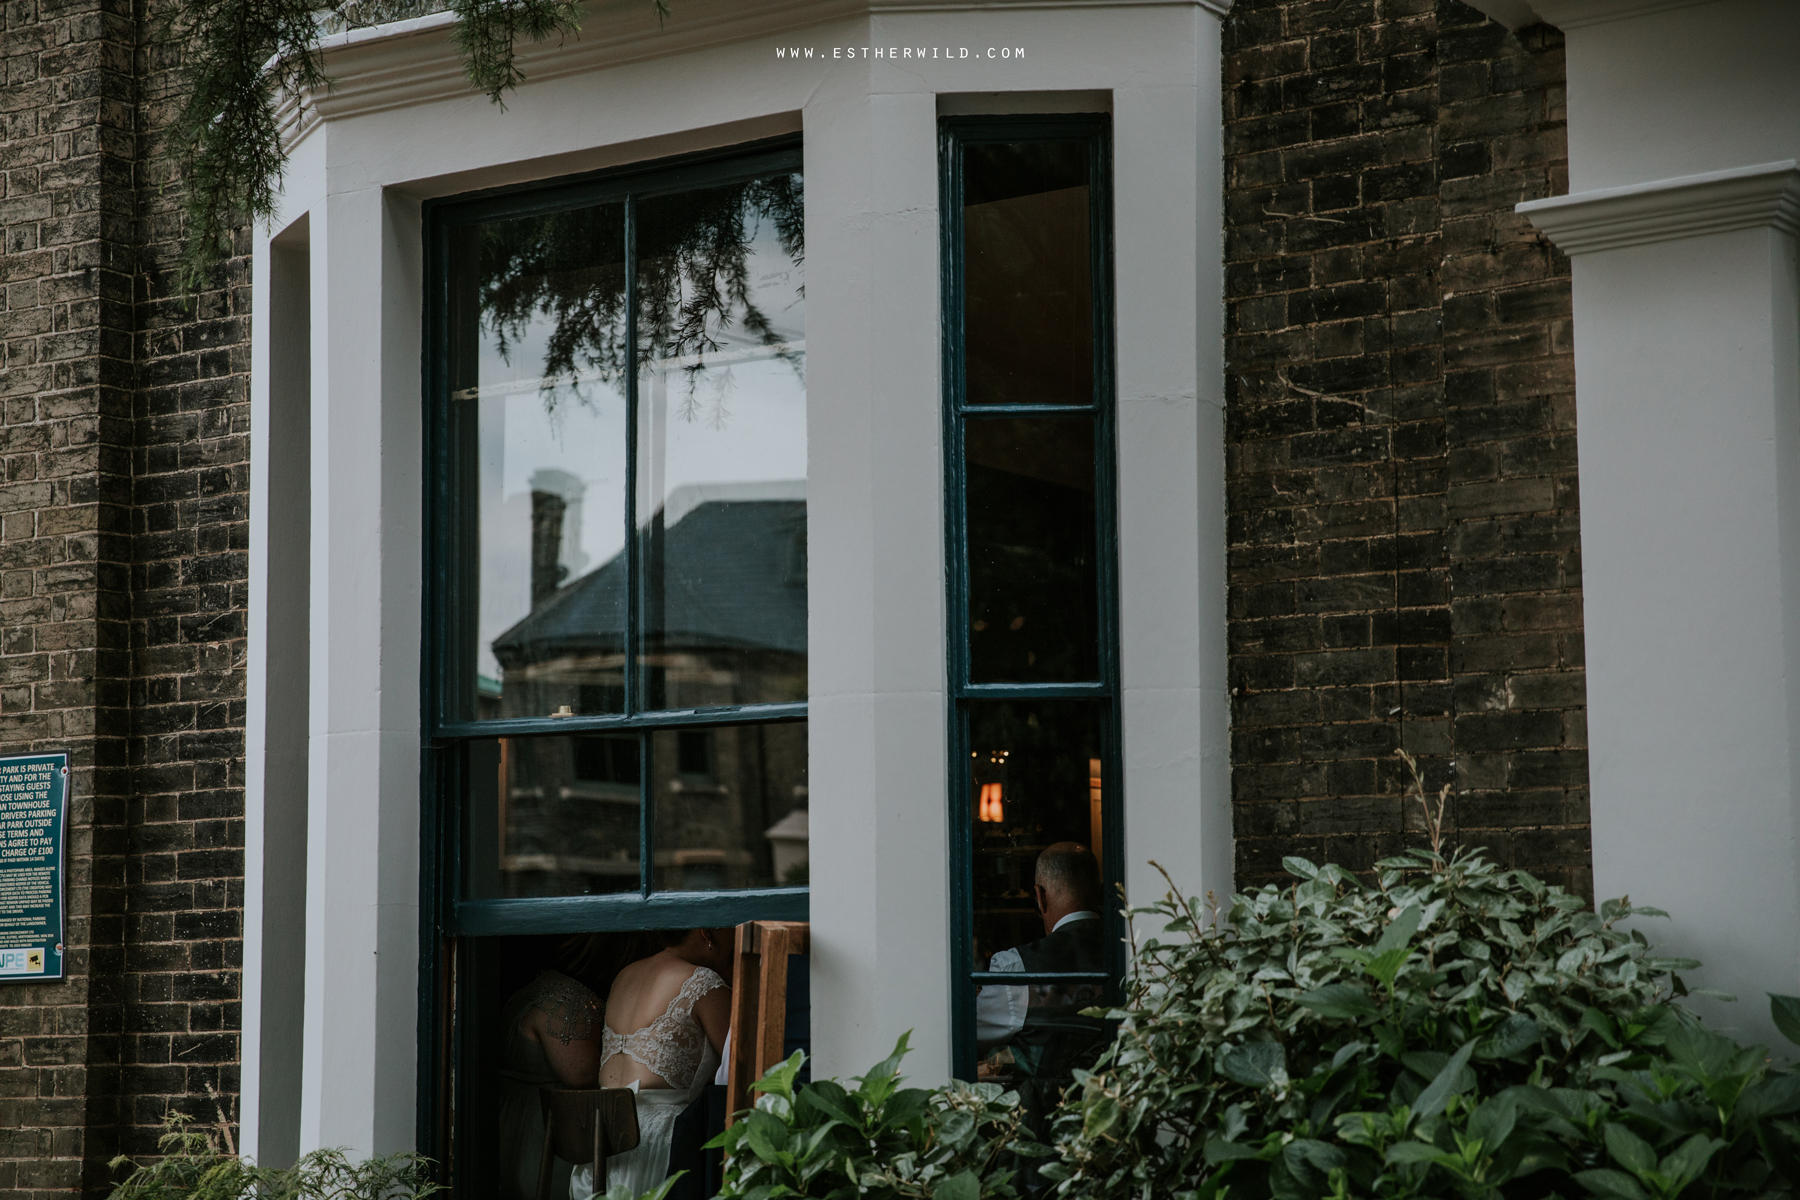 The_Georgian_Townhouse_Wedding_Norwich_Esther_Wild_Photographer_3R8A2018.jpg